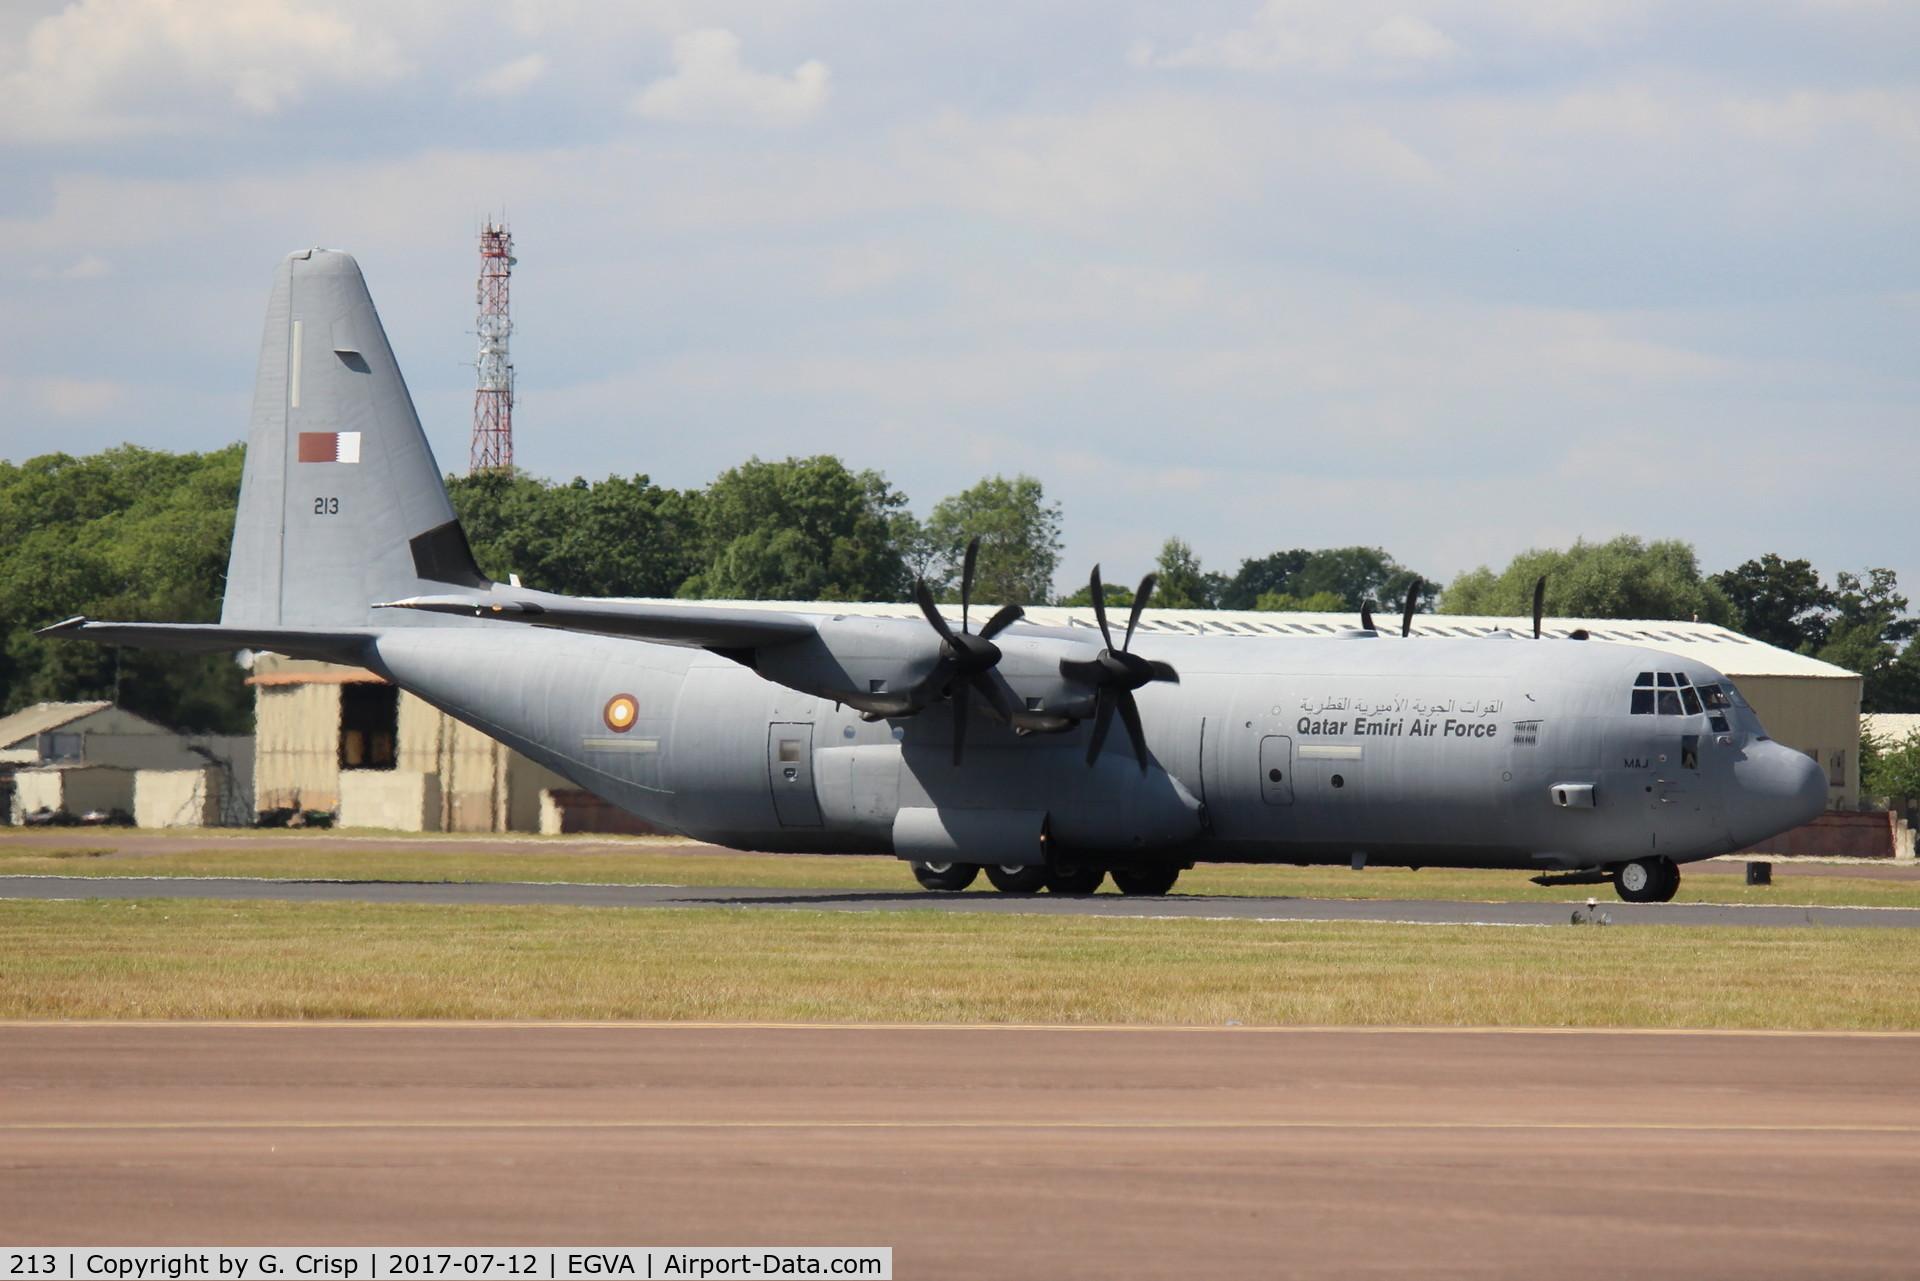 213, 2011 Lockheed Martin C-130J-30 Super Hercules C/N 382-5668, RAF Fairford, UK